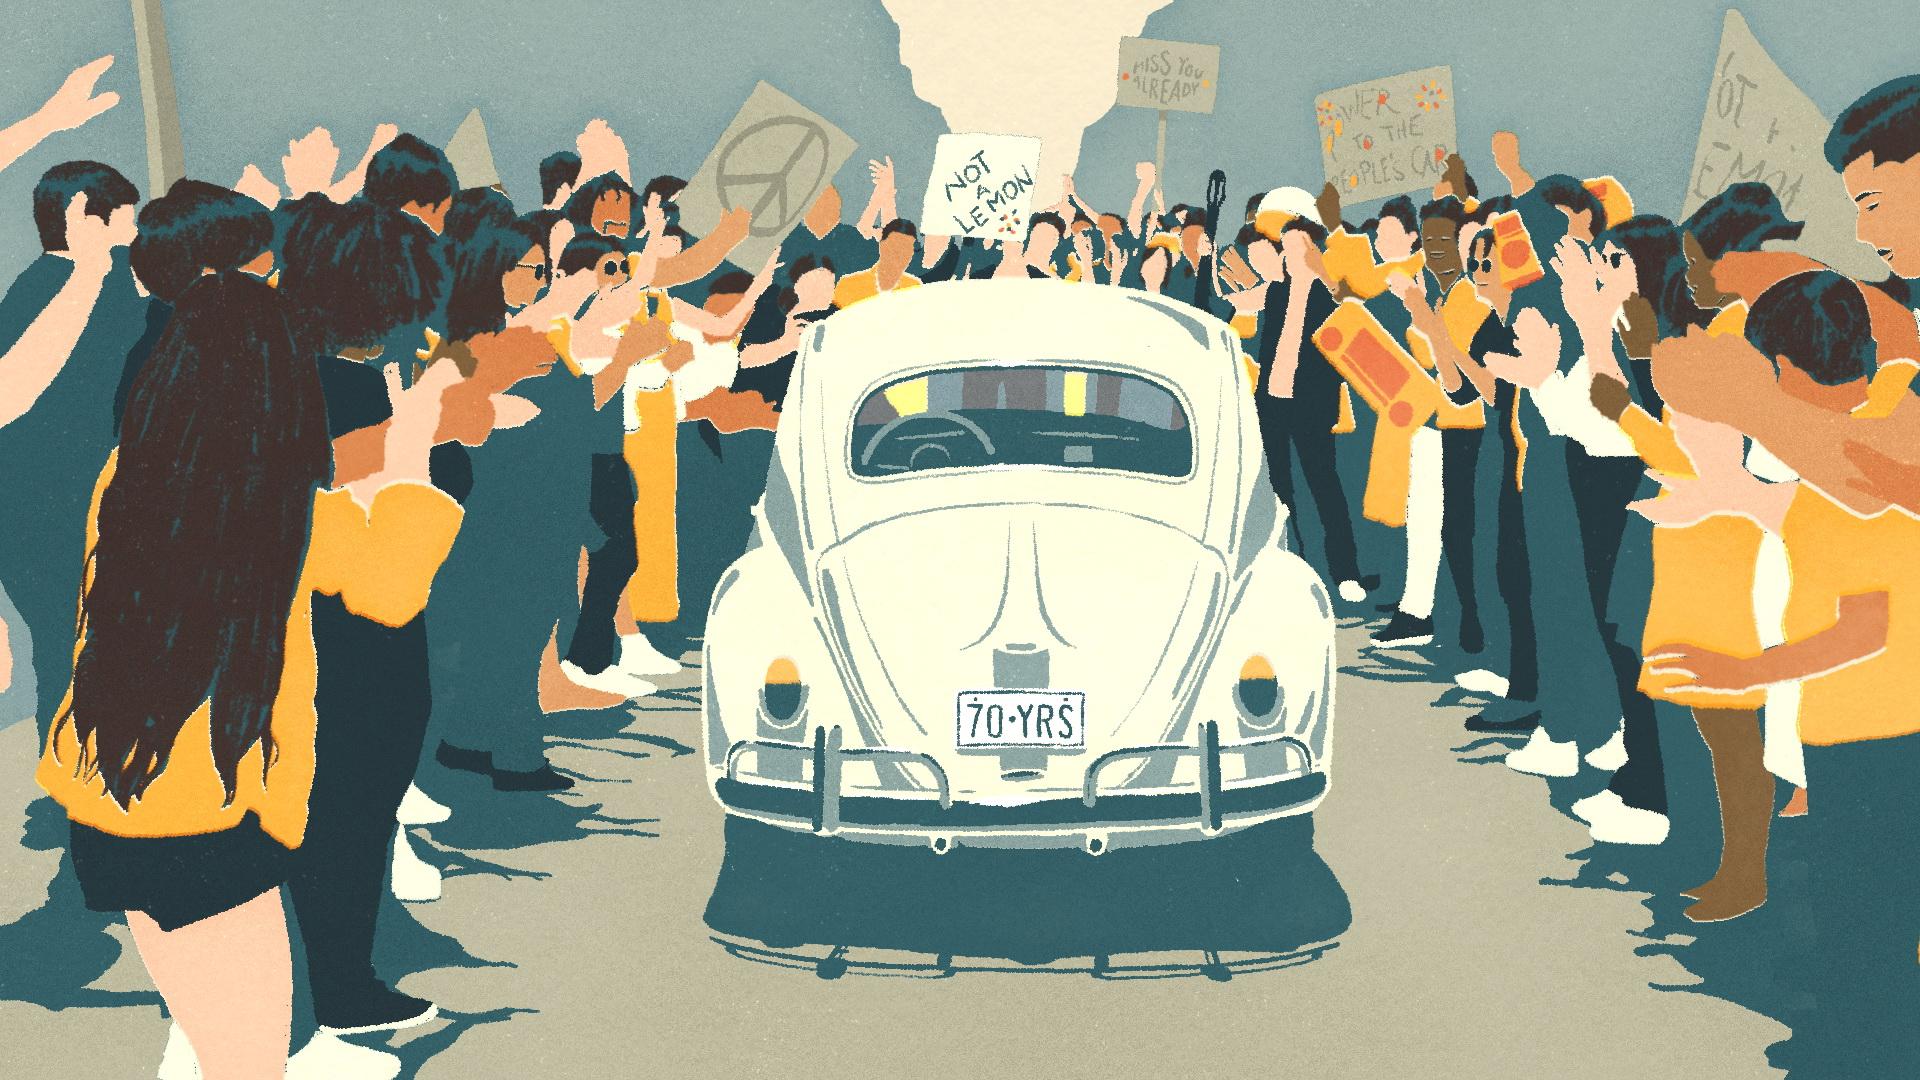 Vw Beetle The Last Mile Campaign 4